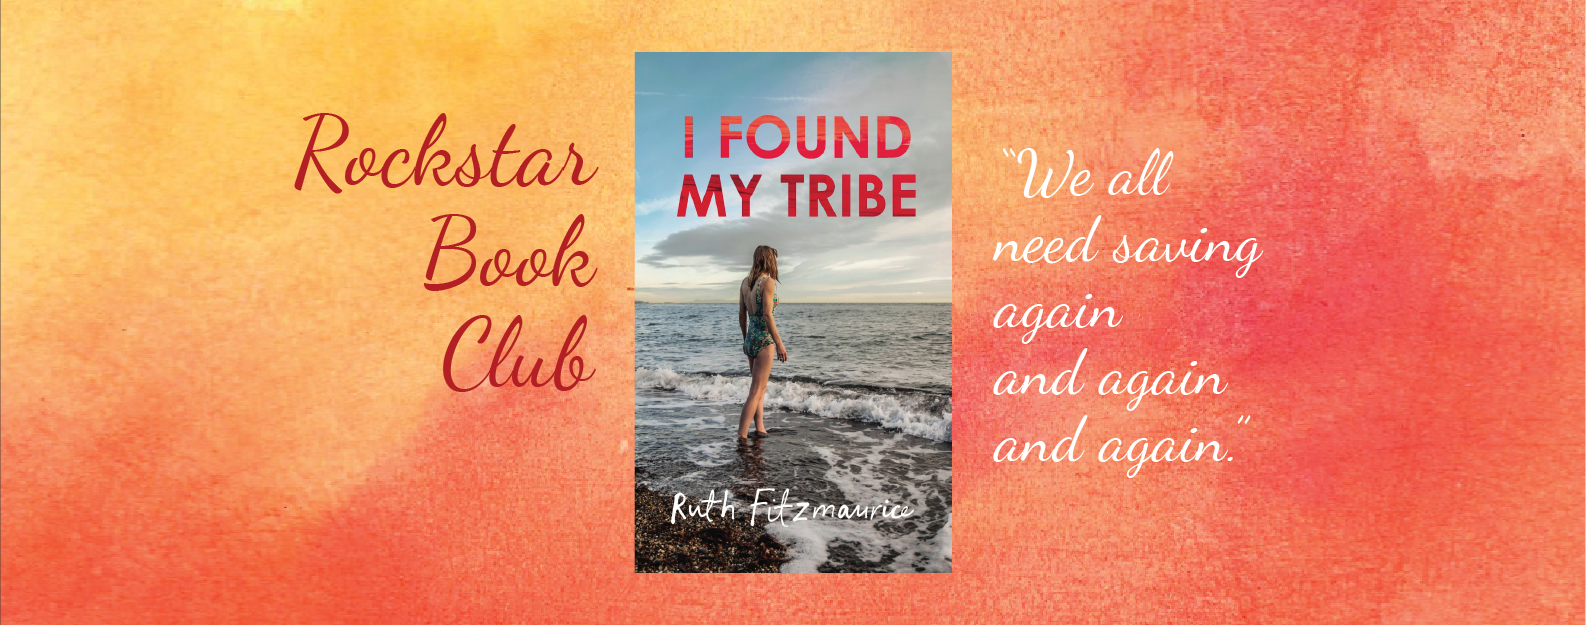 Rockstar Book Club: I Found My Tribe by Ruth Fitzmaurice